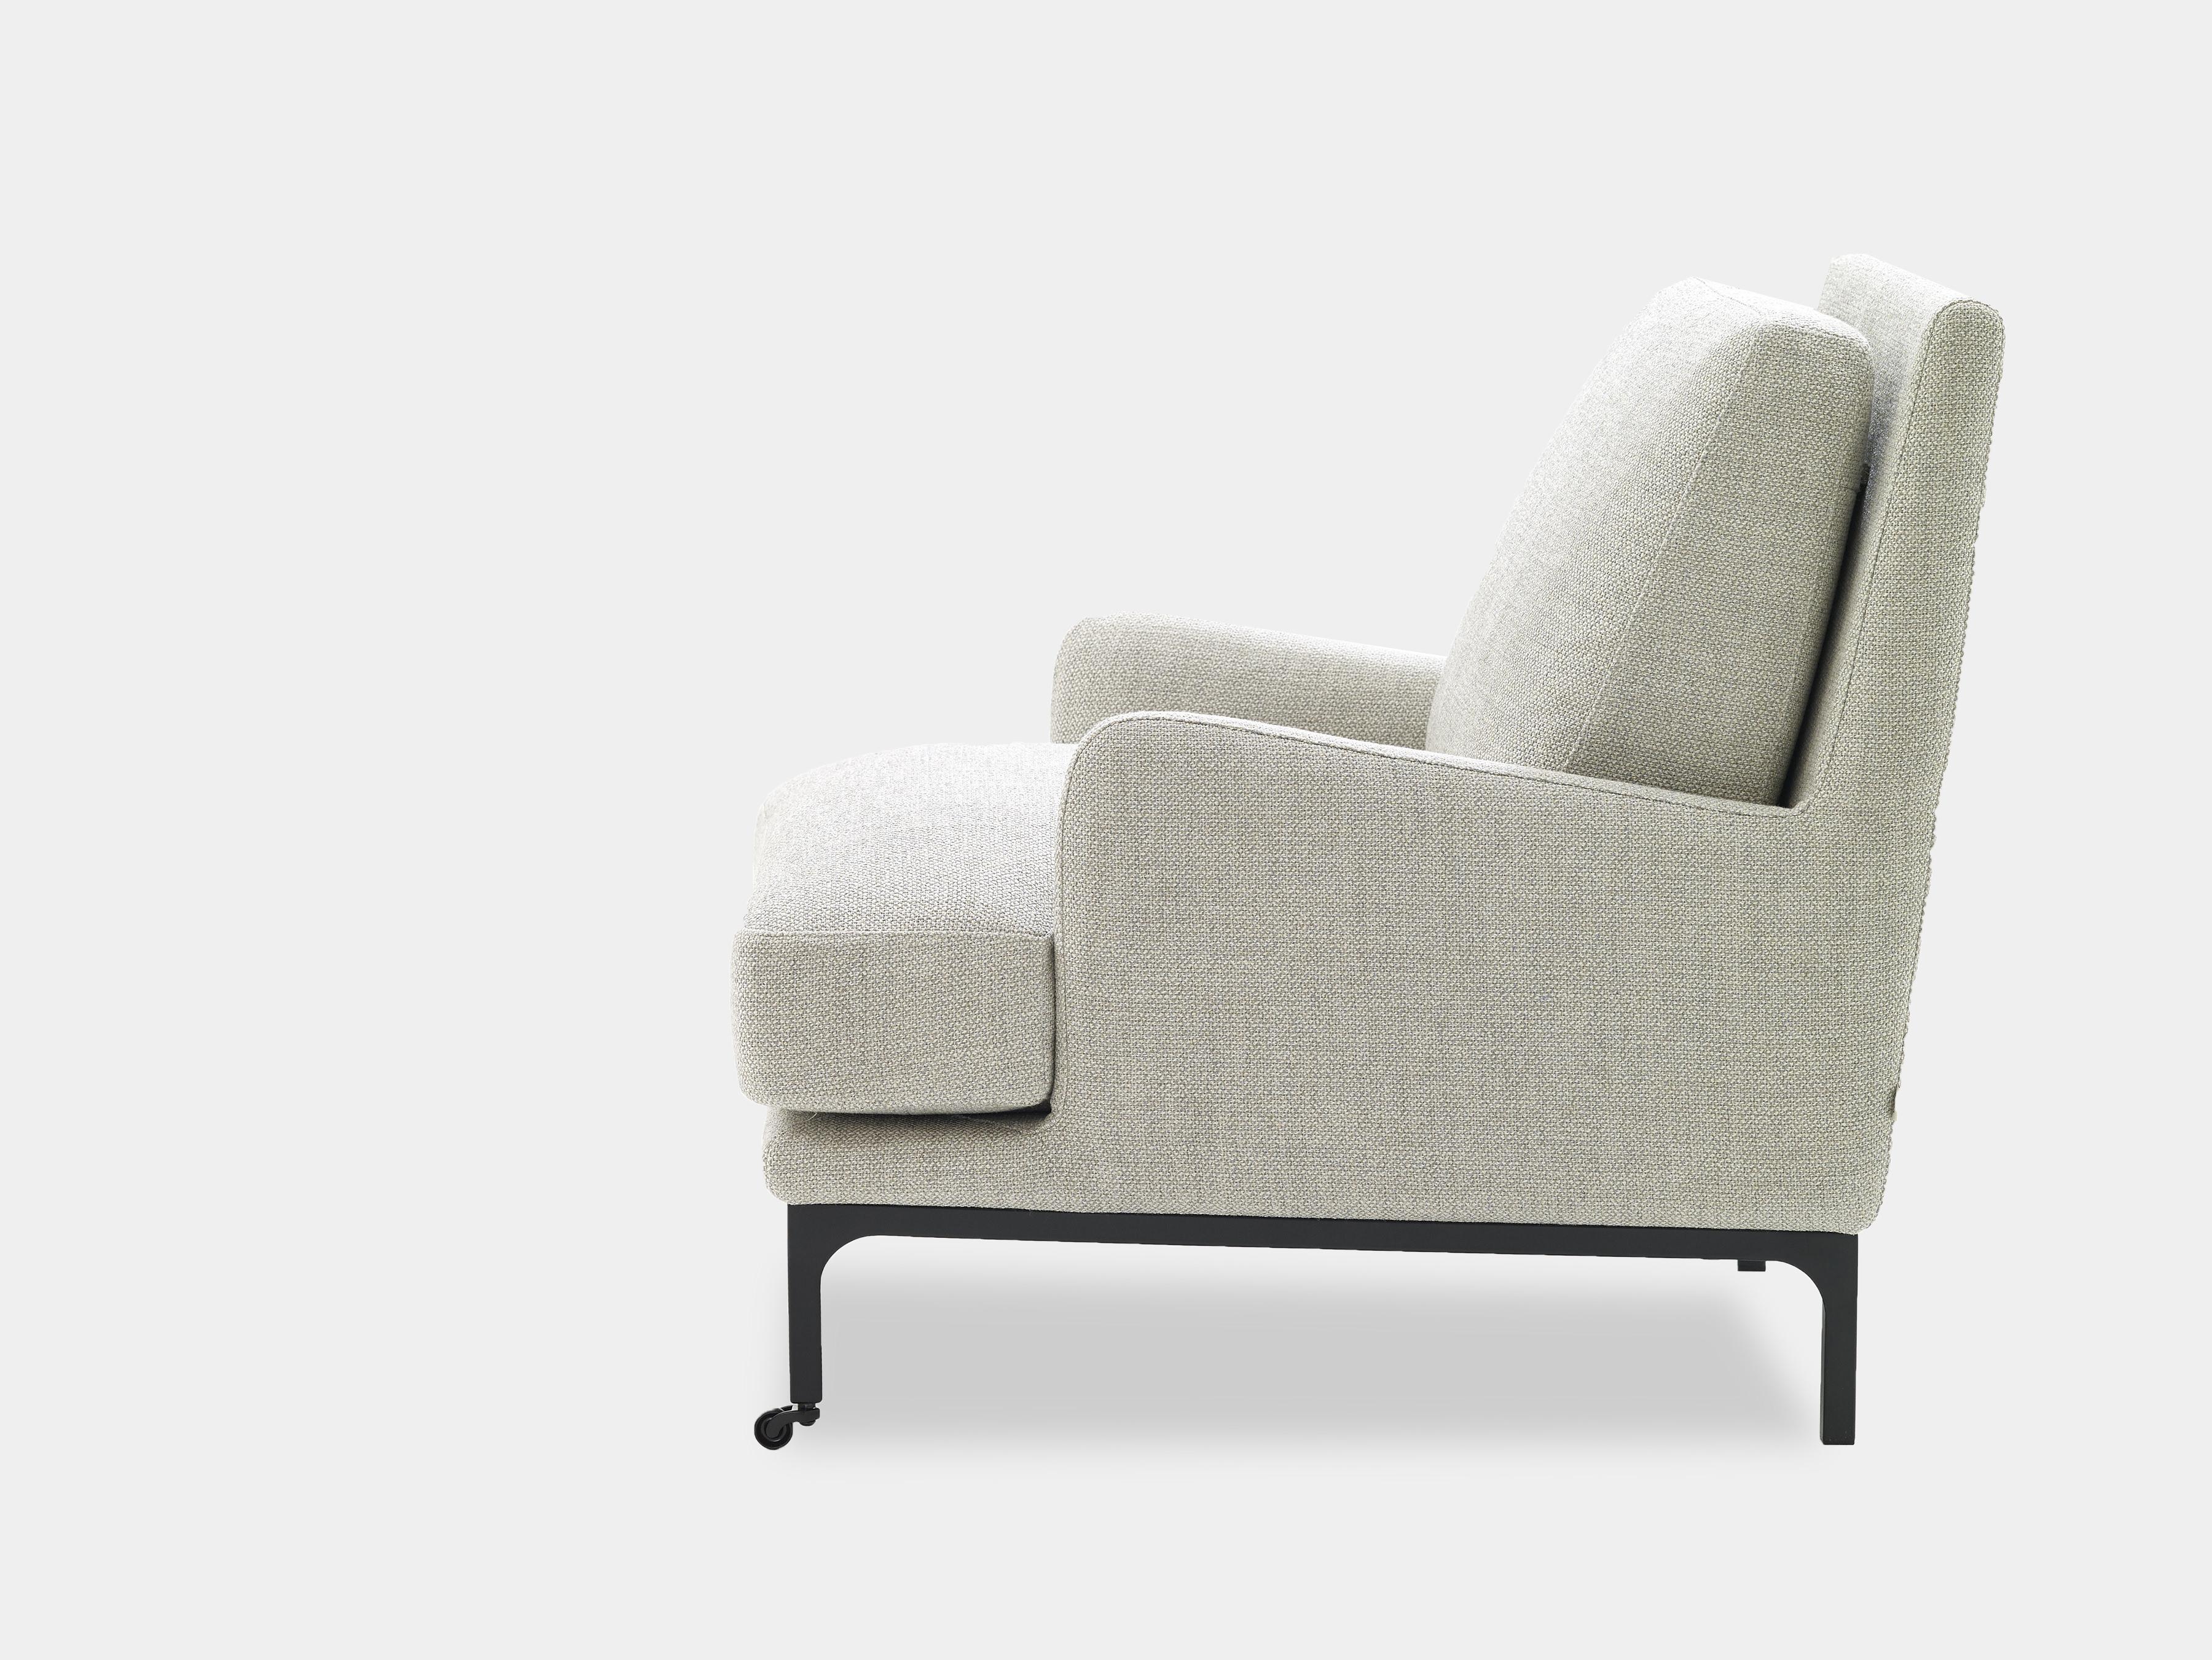 mr jones easy chair 031